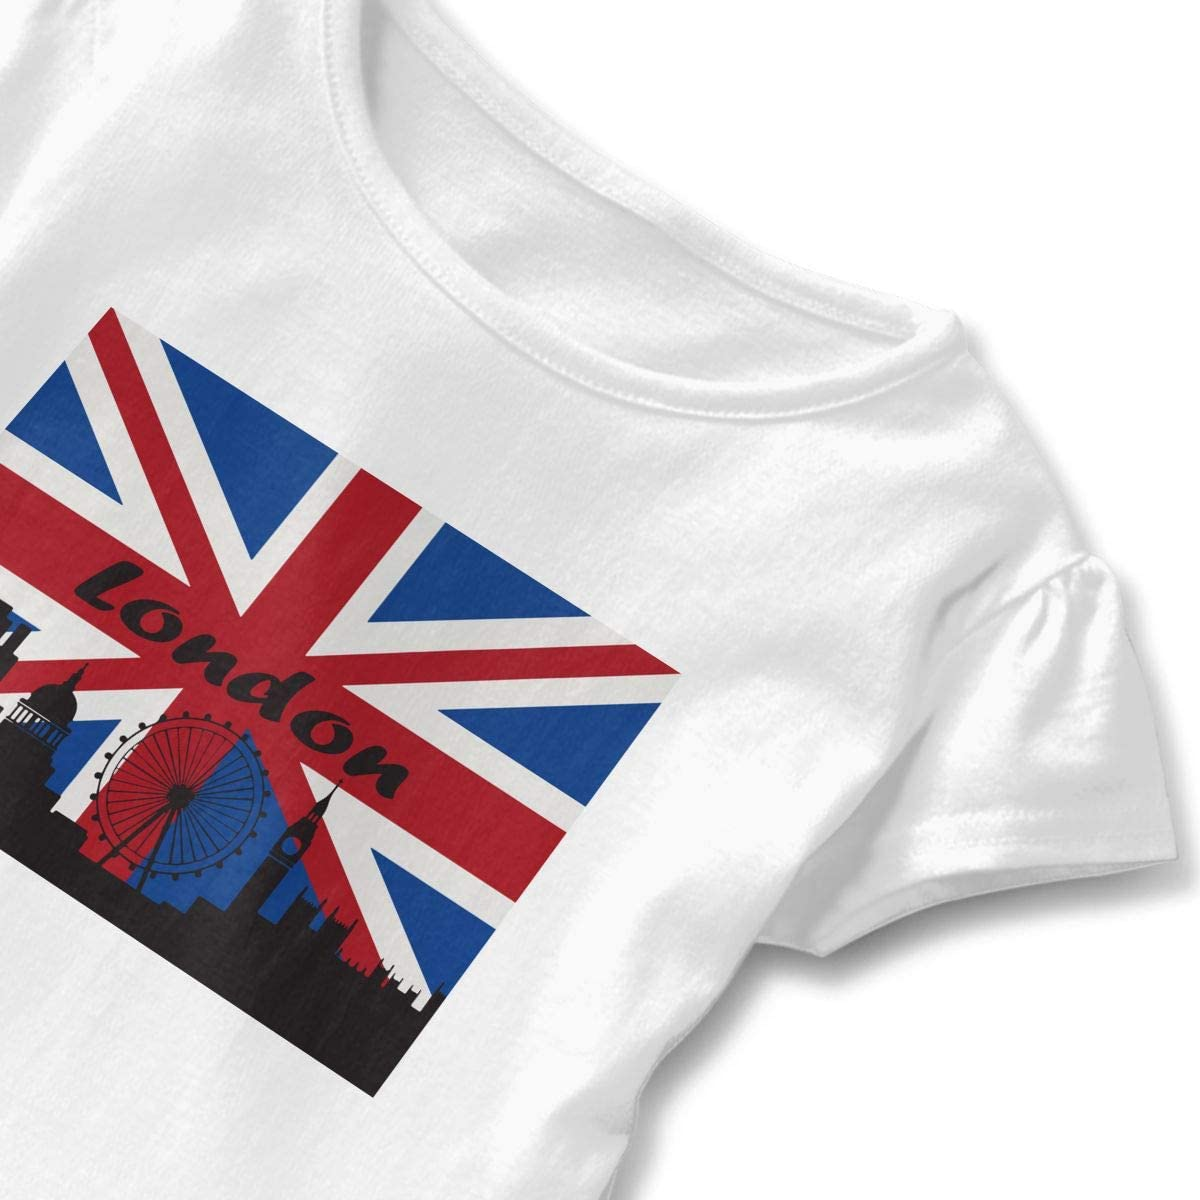 SC/_VD08 English Bulldog Kids Children Short Sleeve Tshirts Clothes